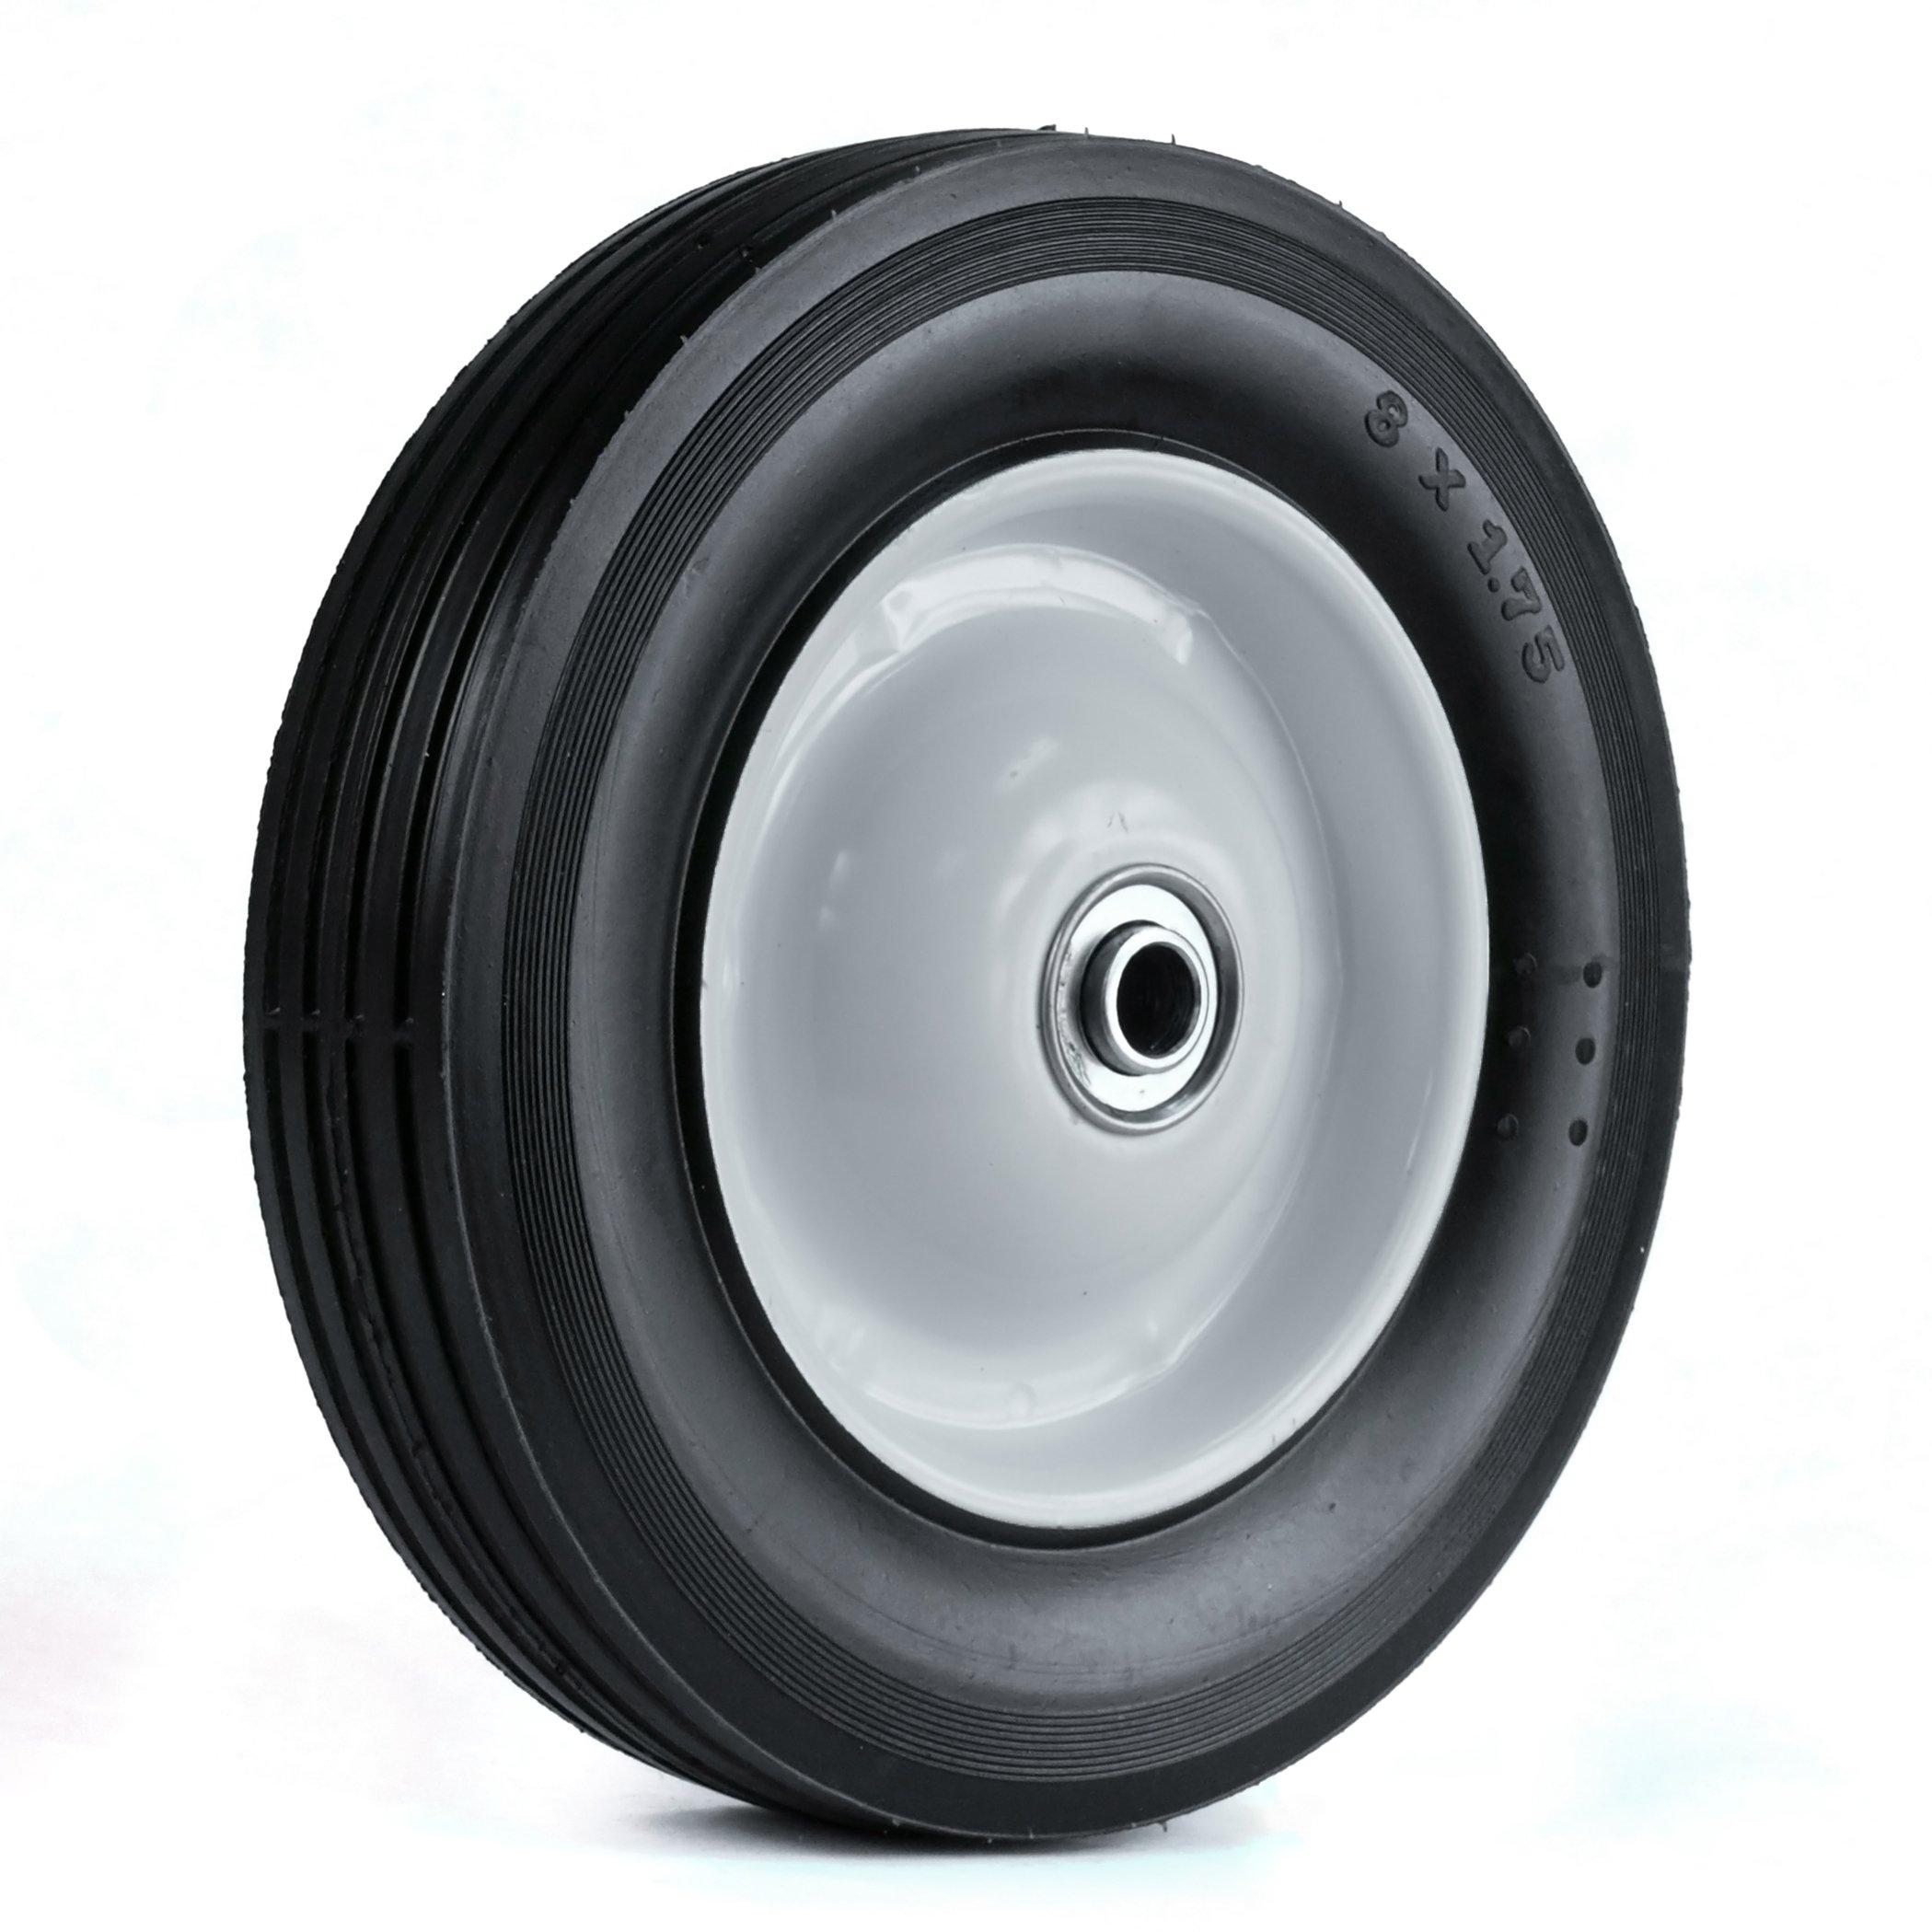 Martin Wheel 875-OF-R 8 by 1.75-Inch Light Duty Steel Wheel for Lawn Mower, 1/2-Inch Ball Bearing, 1-3/8-Inch Offset Hub, Rib Tread